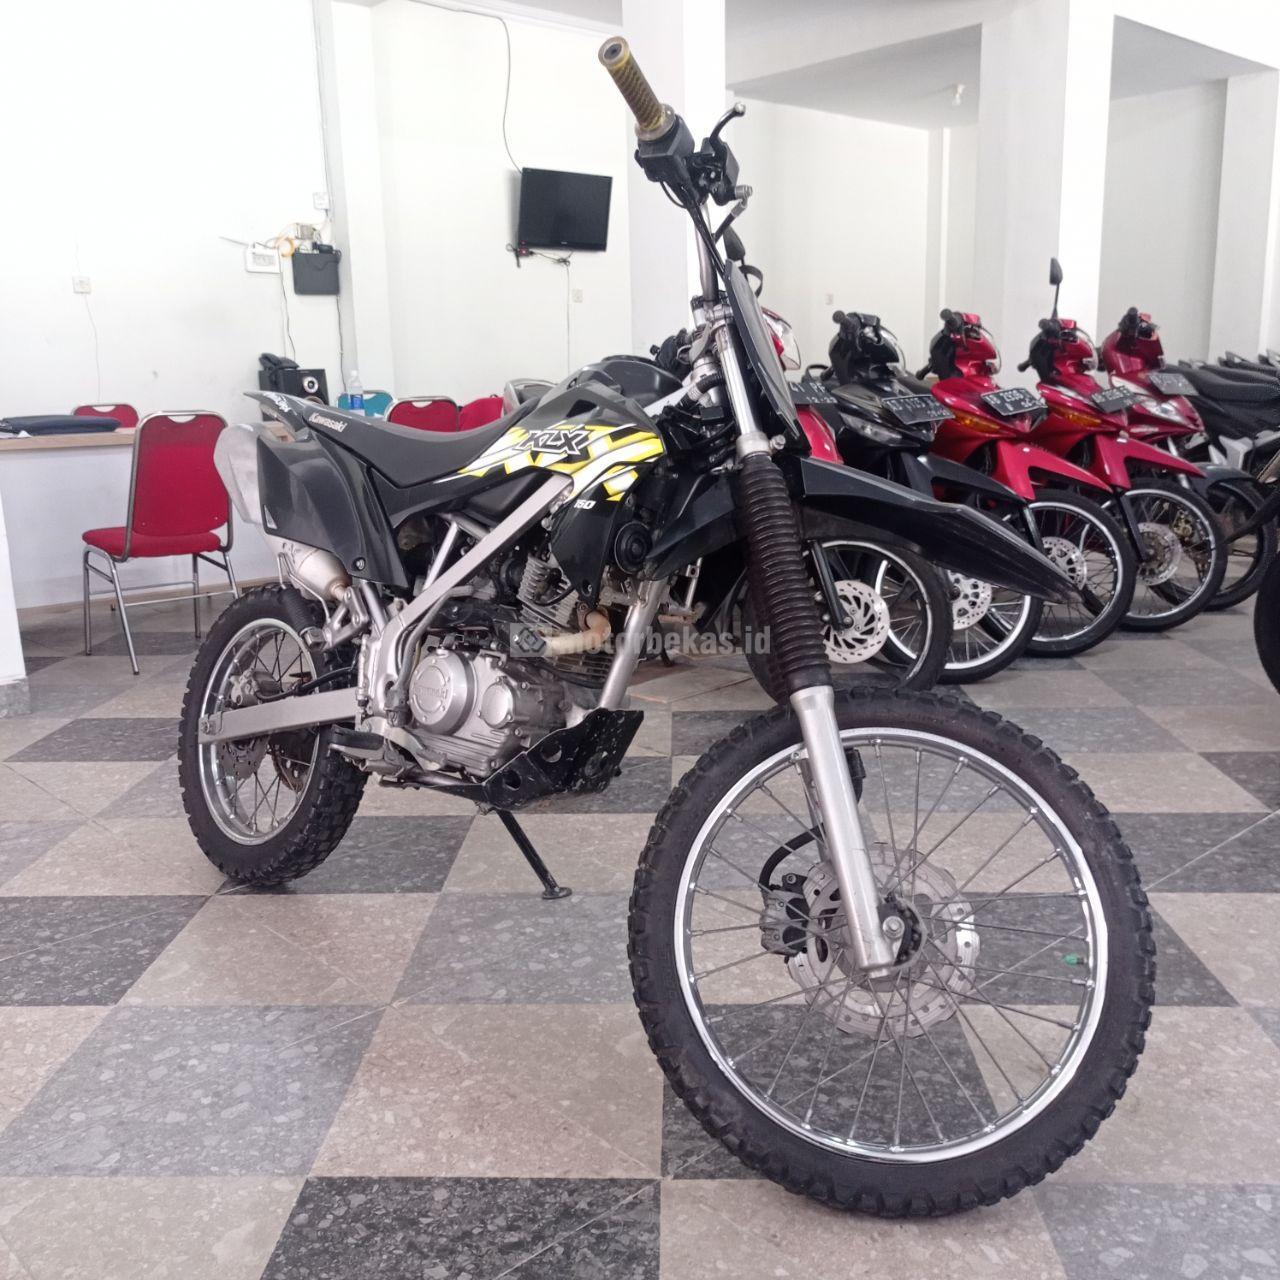 KAWASAKI KLX 150 G  2019 motorbekas.id